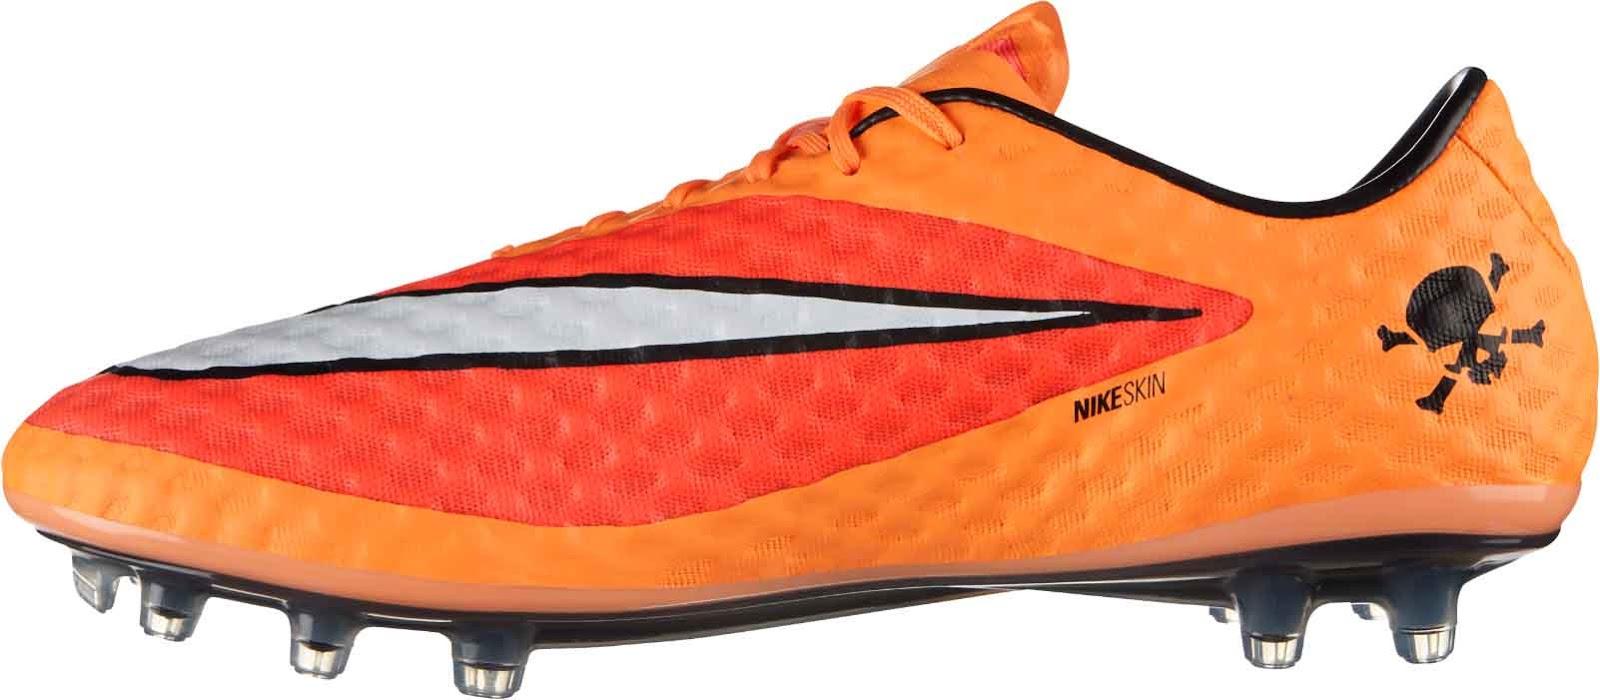 Footy News Orange Nike Hypervenom 14 15 Boot Released